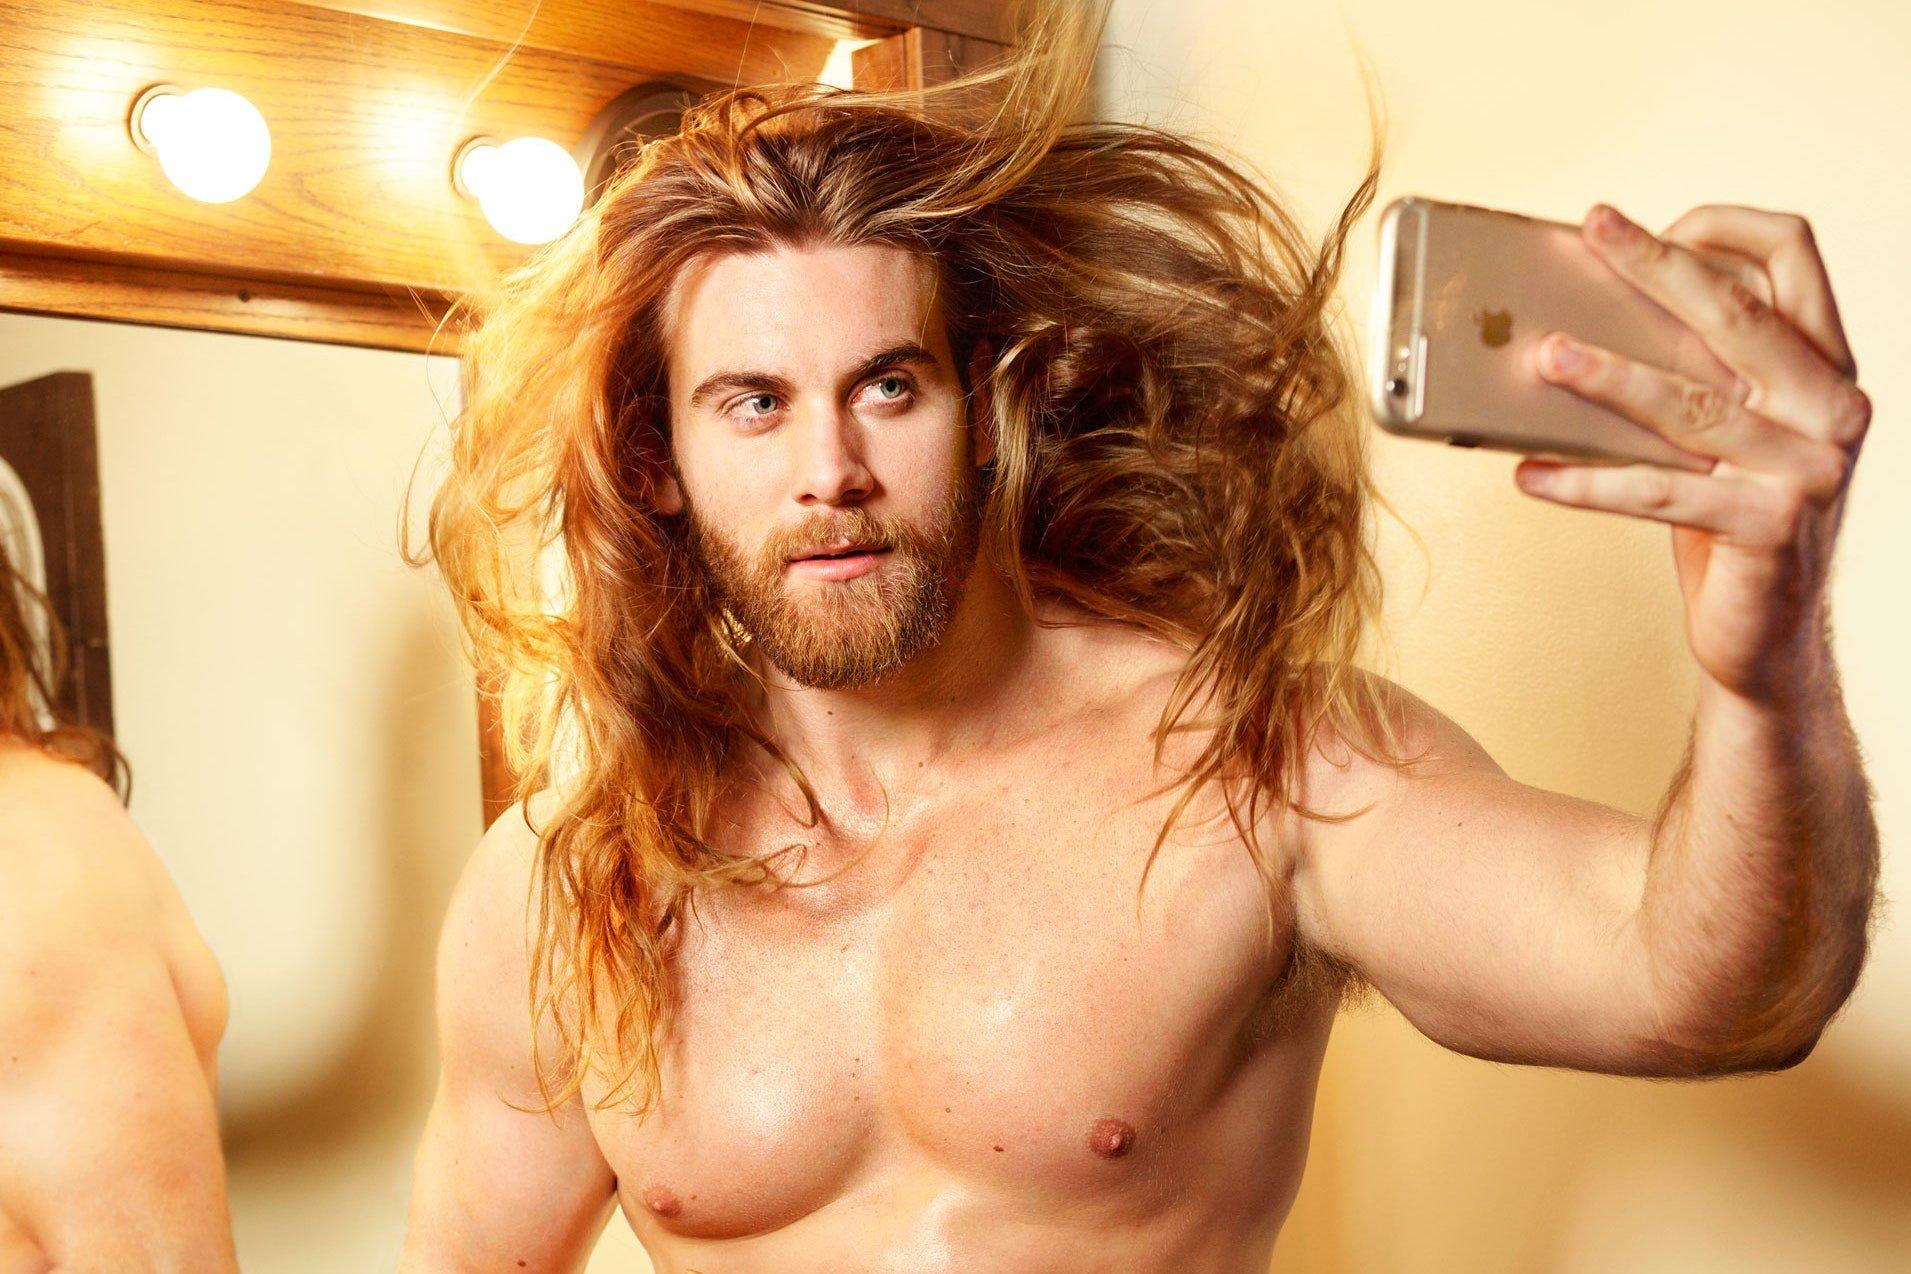 long hair and a beard in men